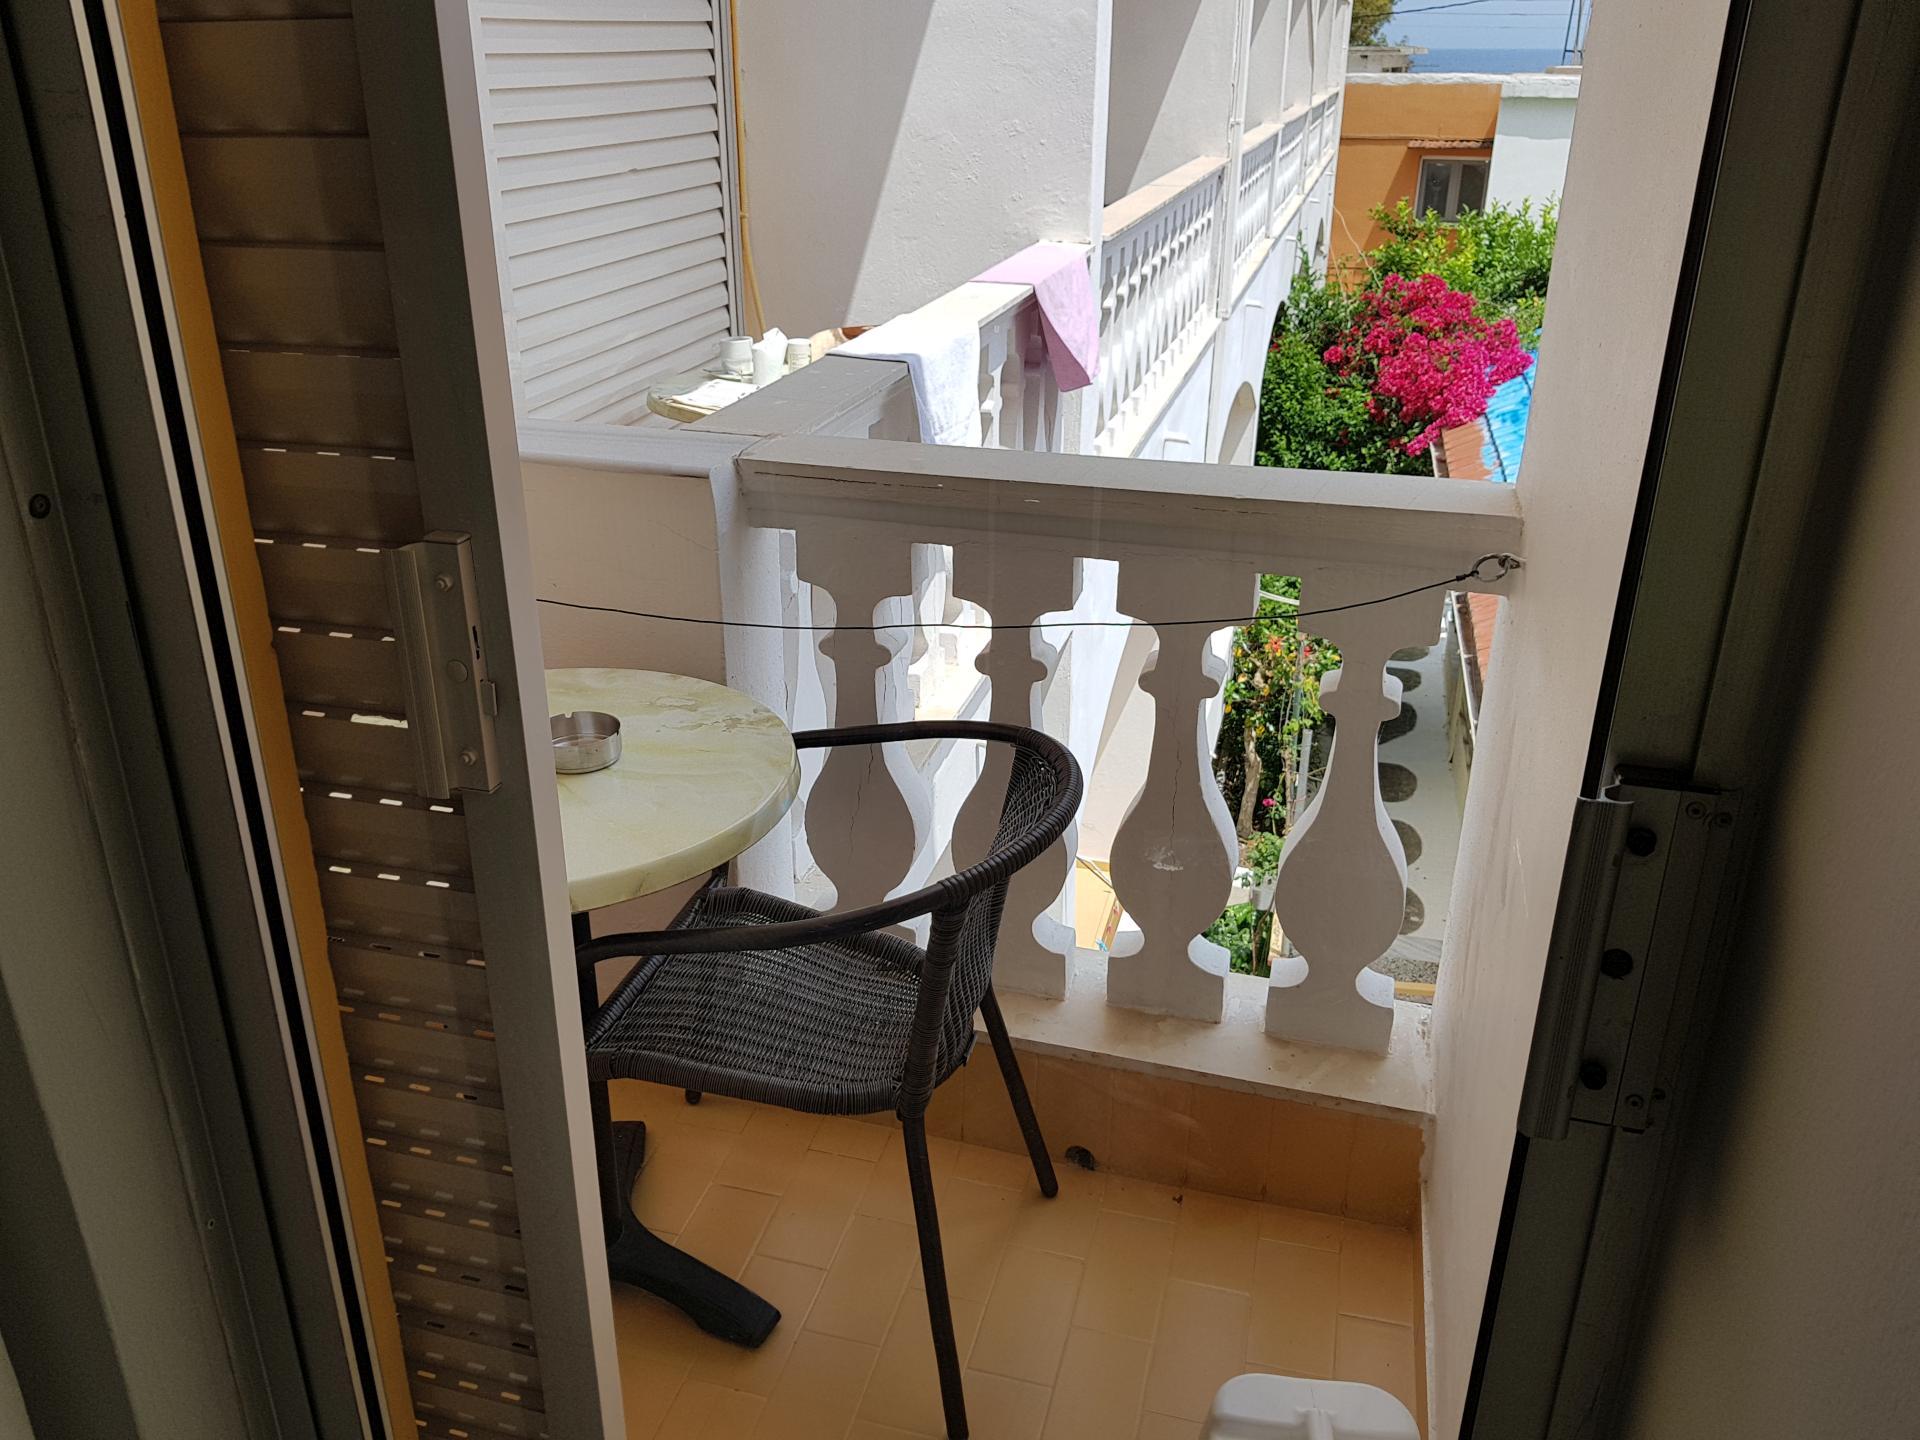 балкон номера в отеле в Бенитсесе